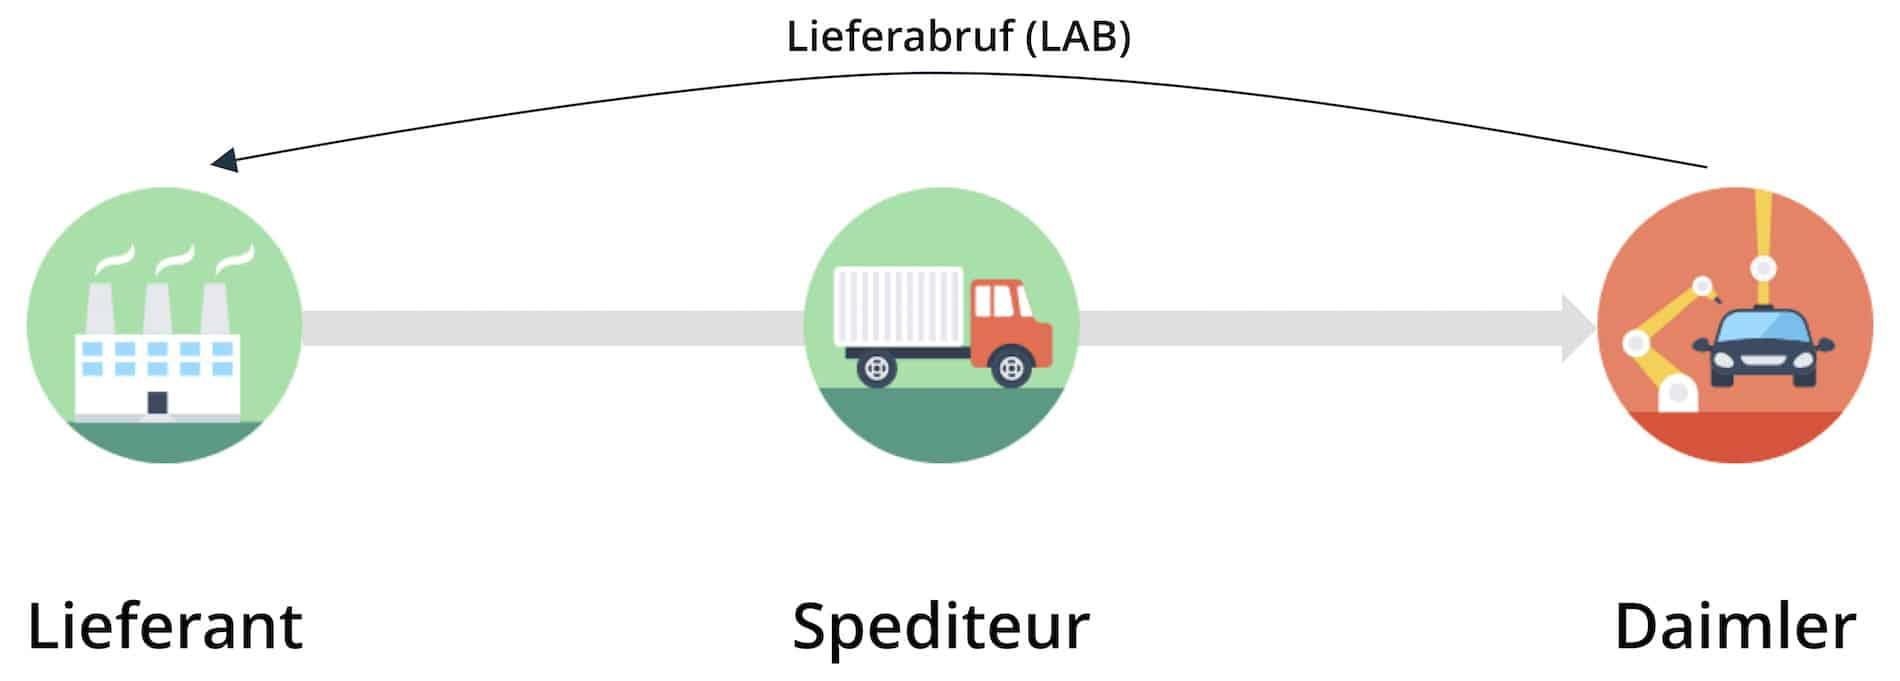 Daimler-Prozess bisher